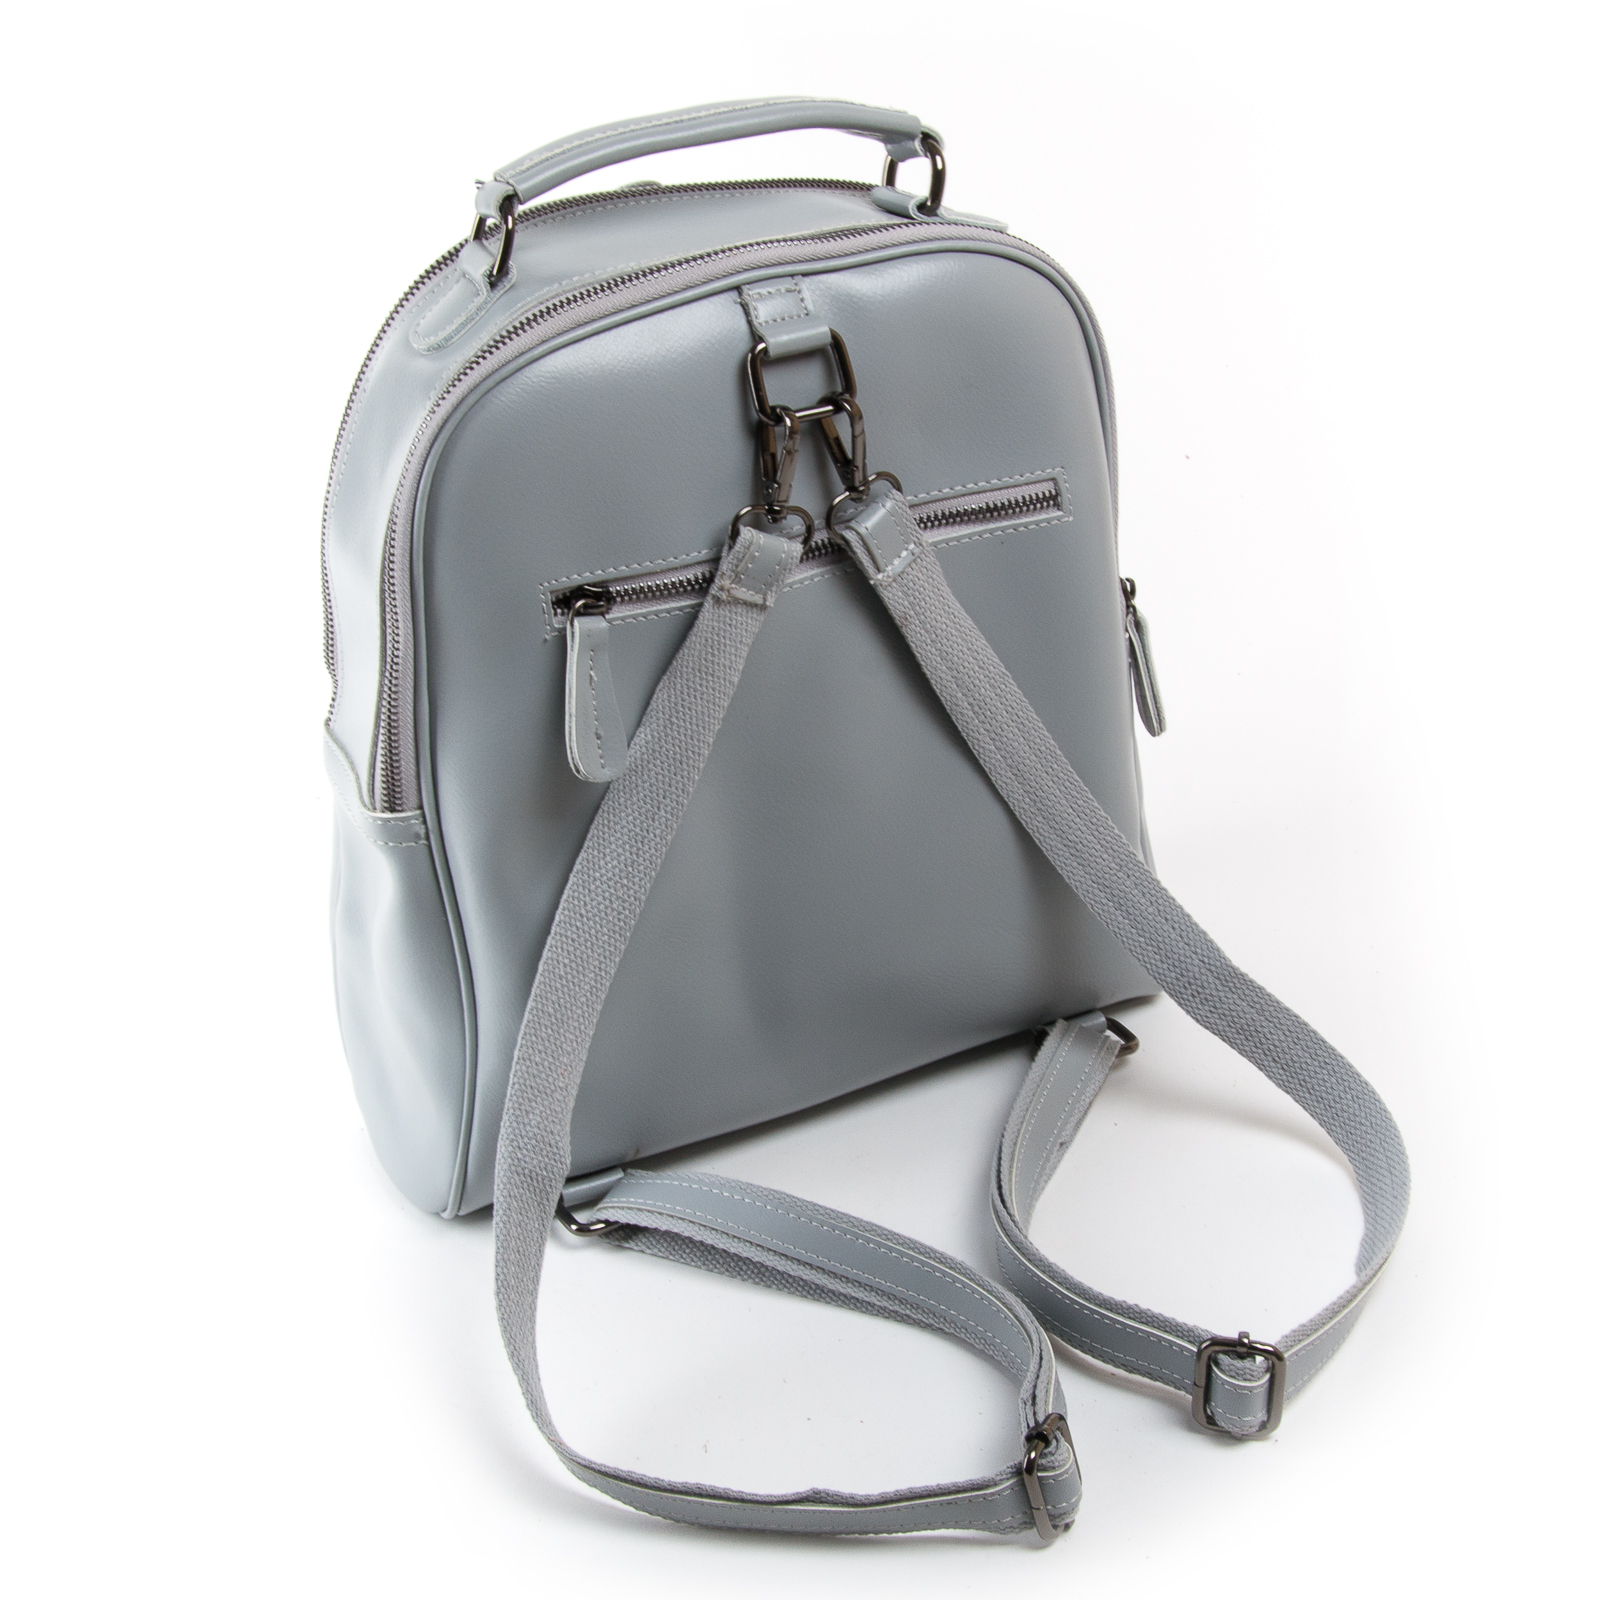 Сумка Женская Рюкзак кожа ALEX RAI 8694-3 l-grey - фото 4